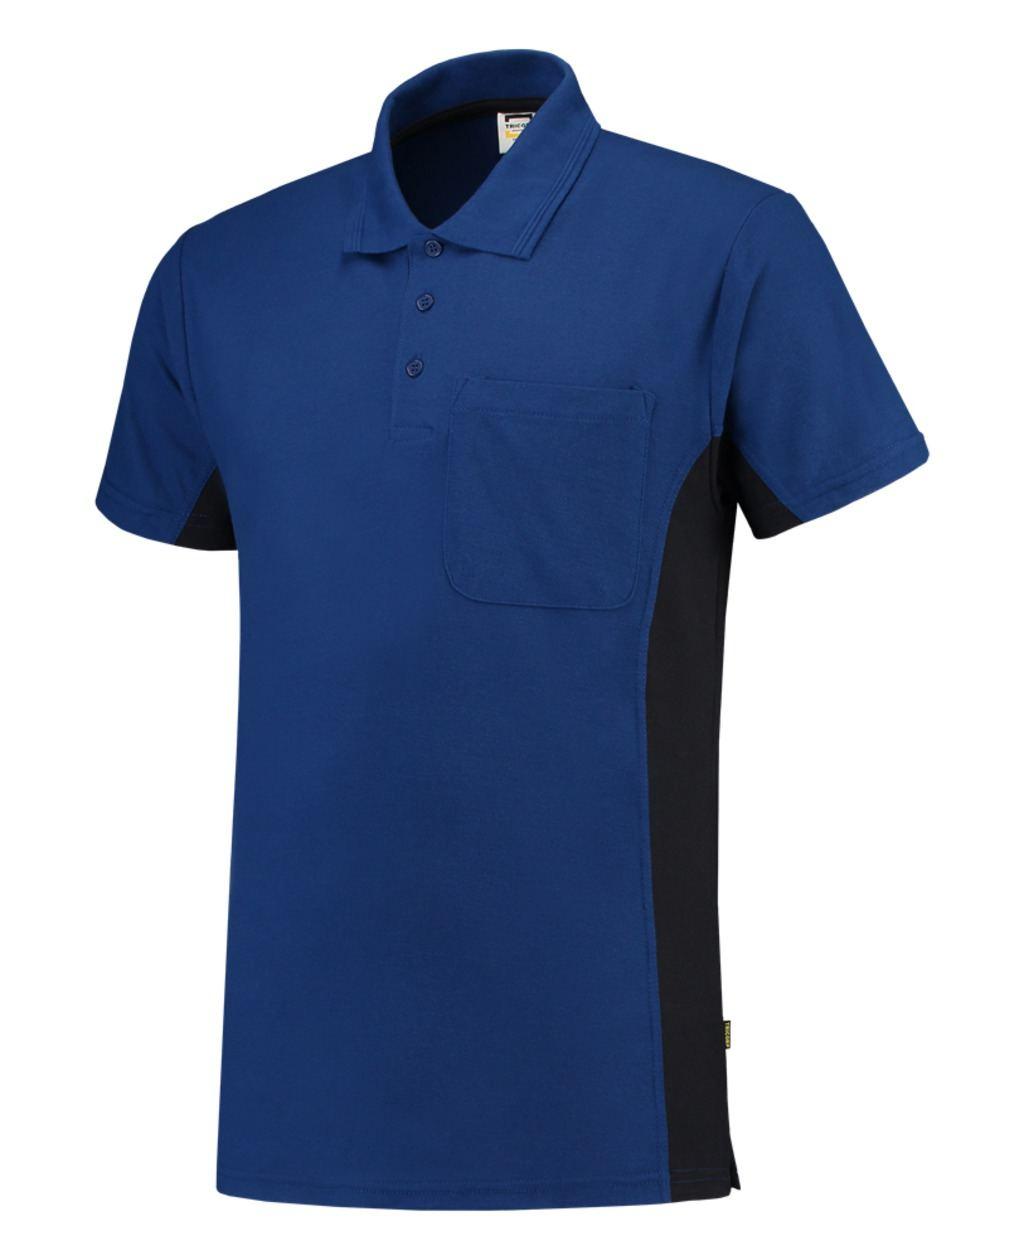 TP2000 Poloshirt